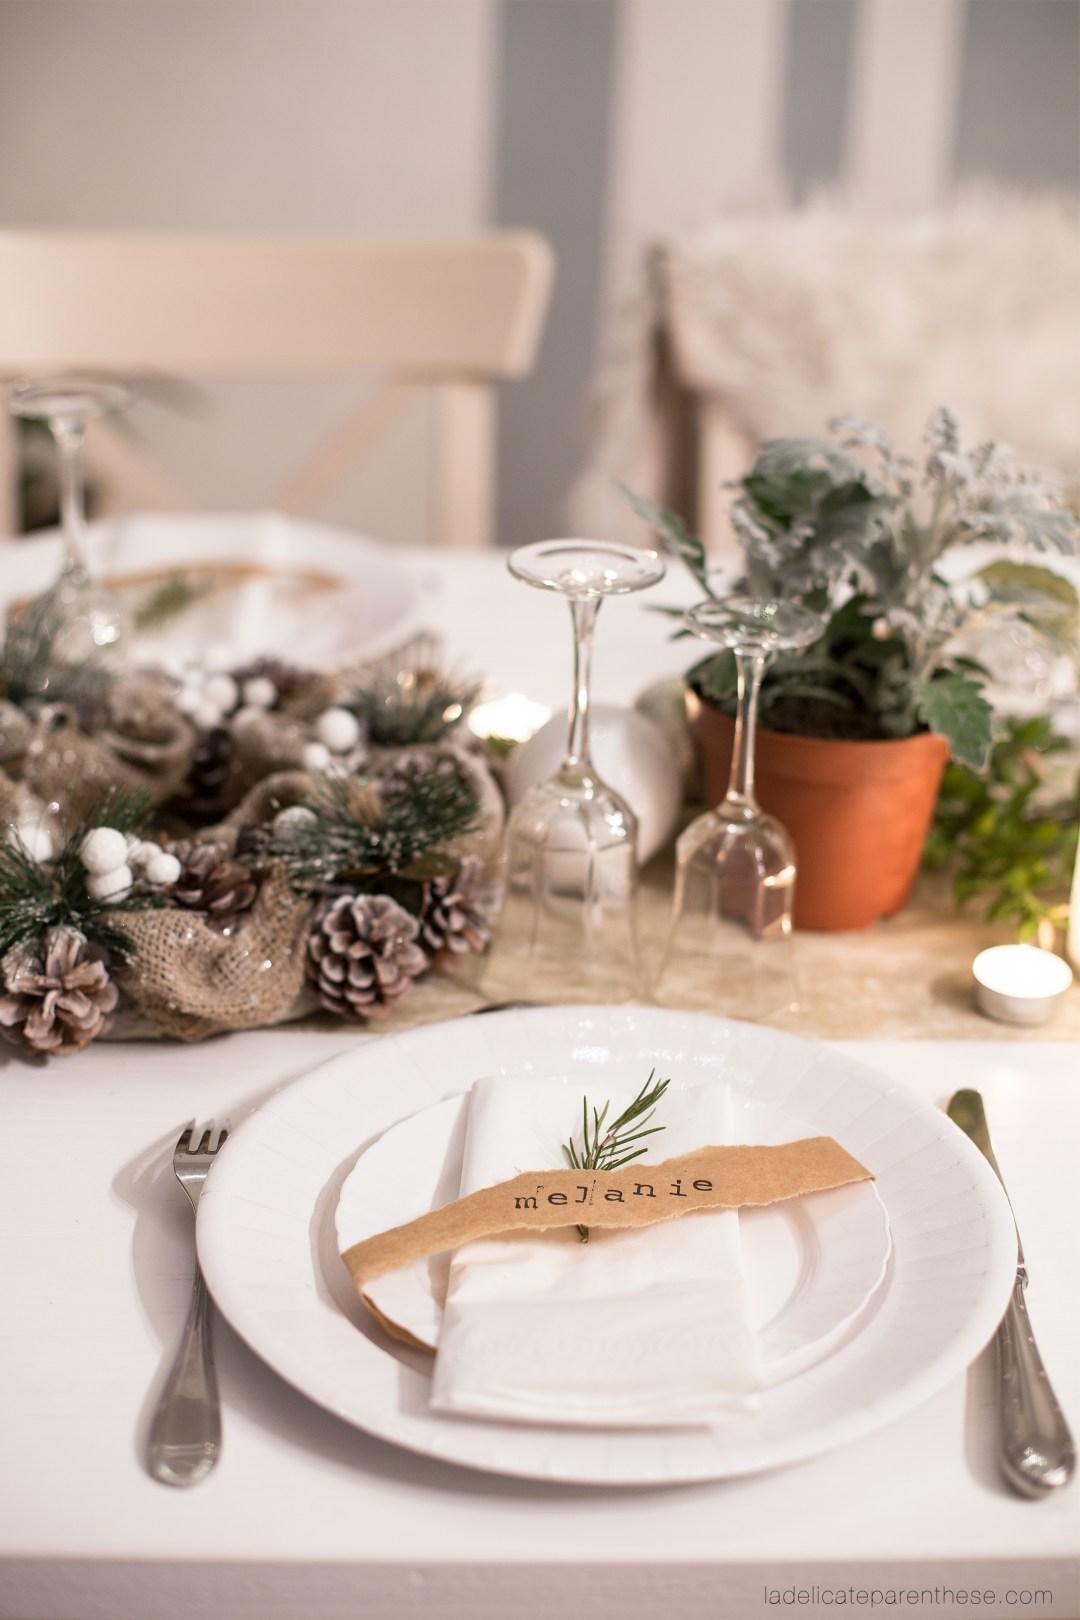 Table de Noel inspiration végétale DIY handmade blog déco